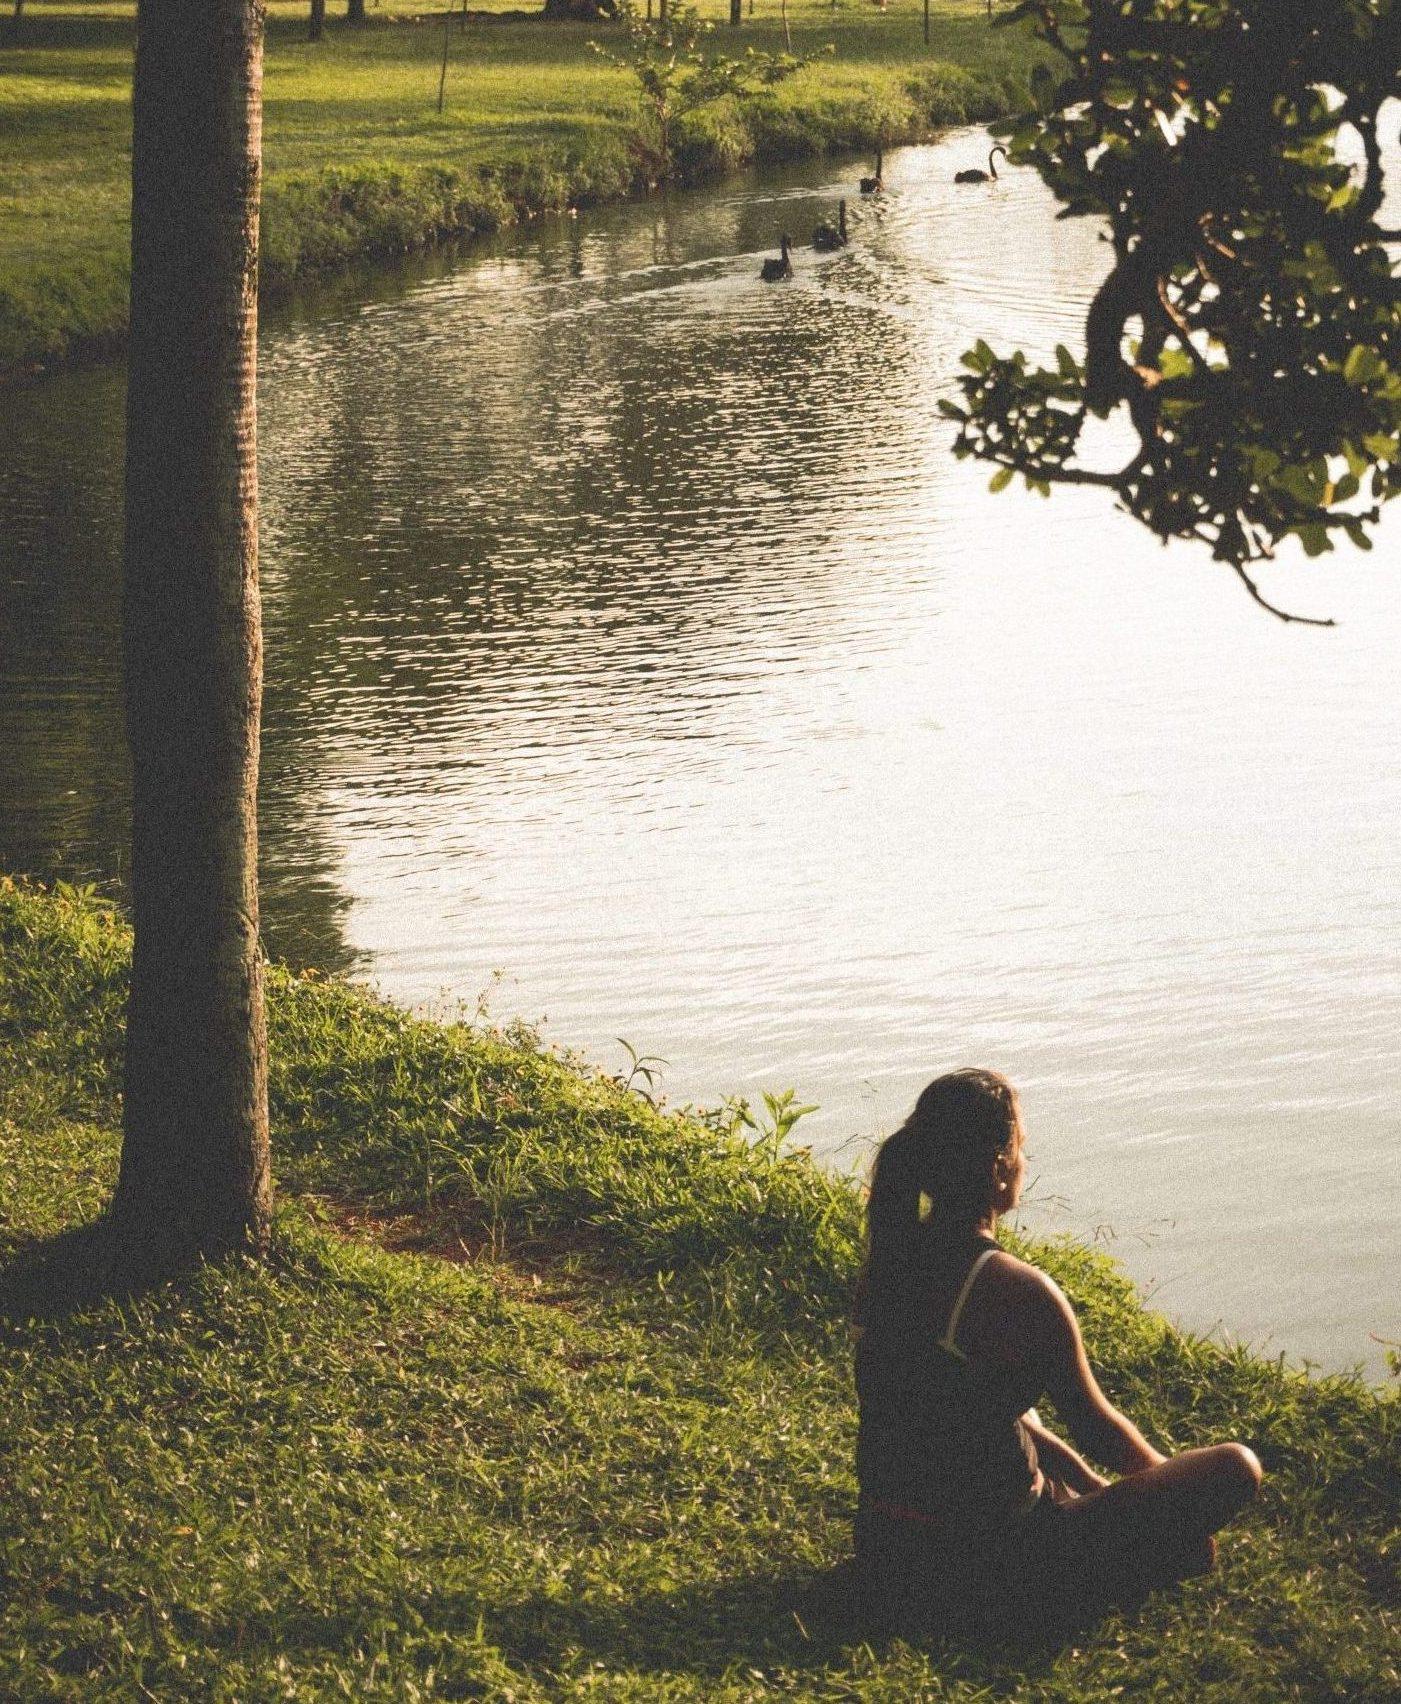 woman-sitting-on-grass-by-lake-290627